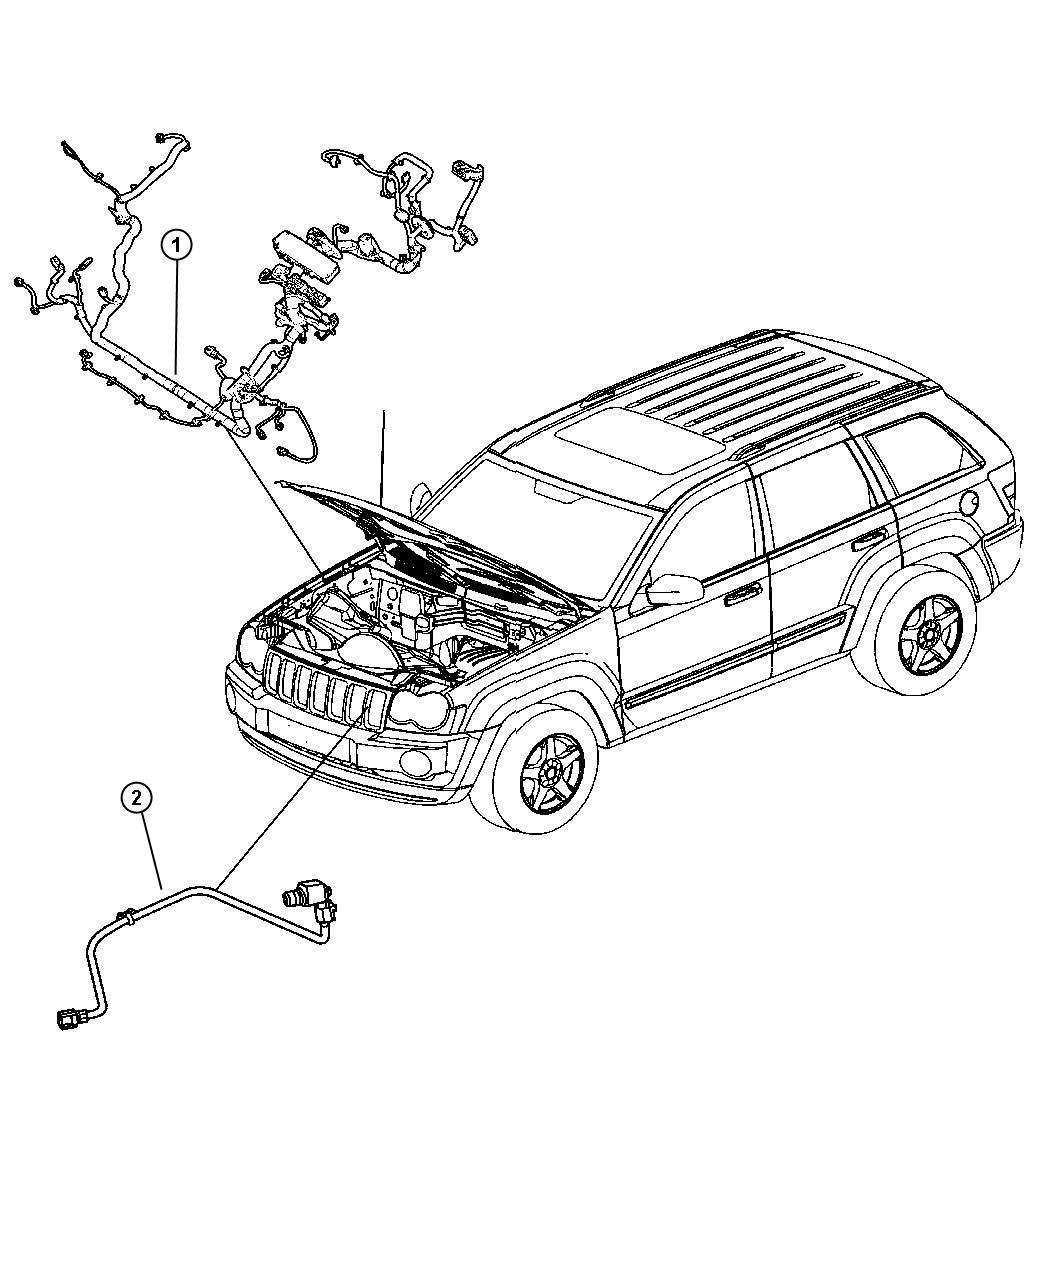 2011 Chrysler 300 Harness, resistor, wiring. Jumper